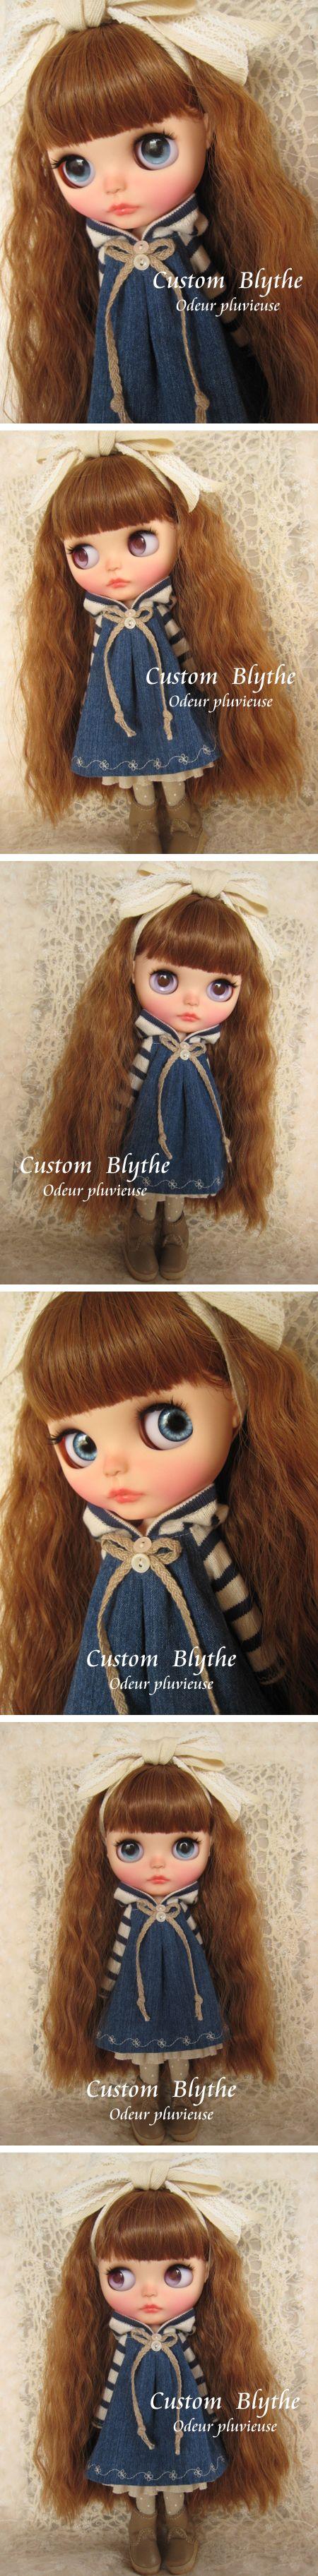 Custom Blythe Dolls: Odeur Pluvieuse Custom Blythe - A Rinkya Blog